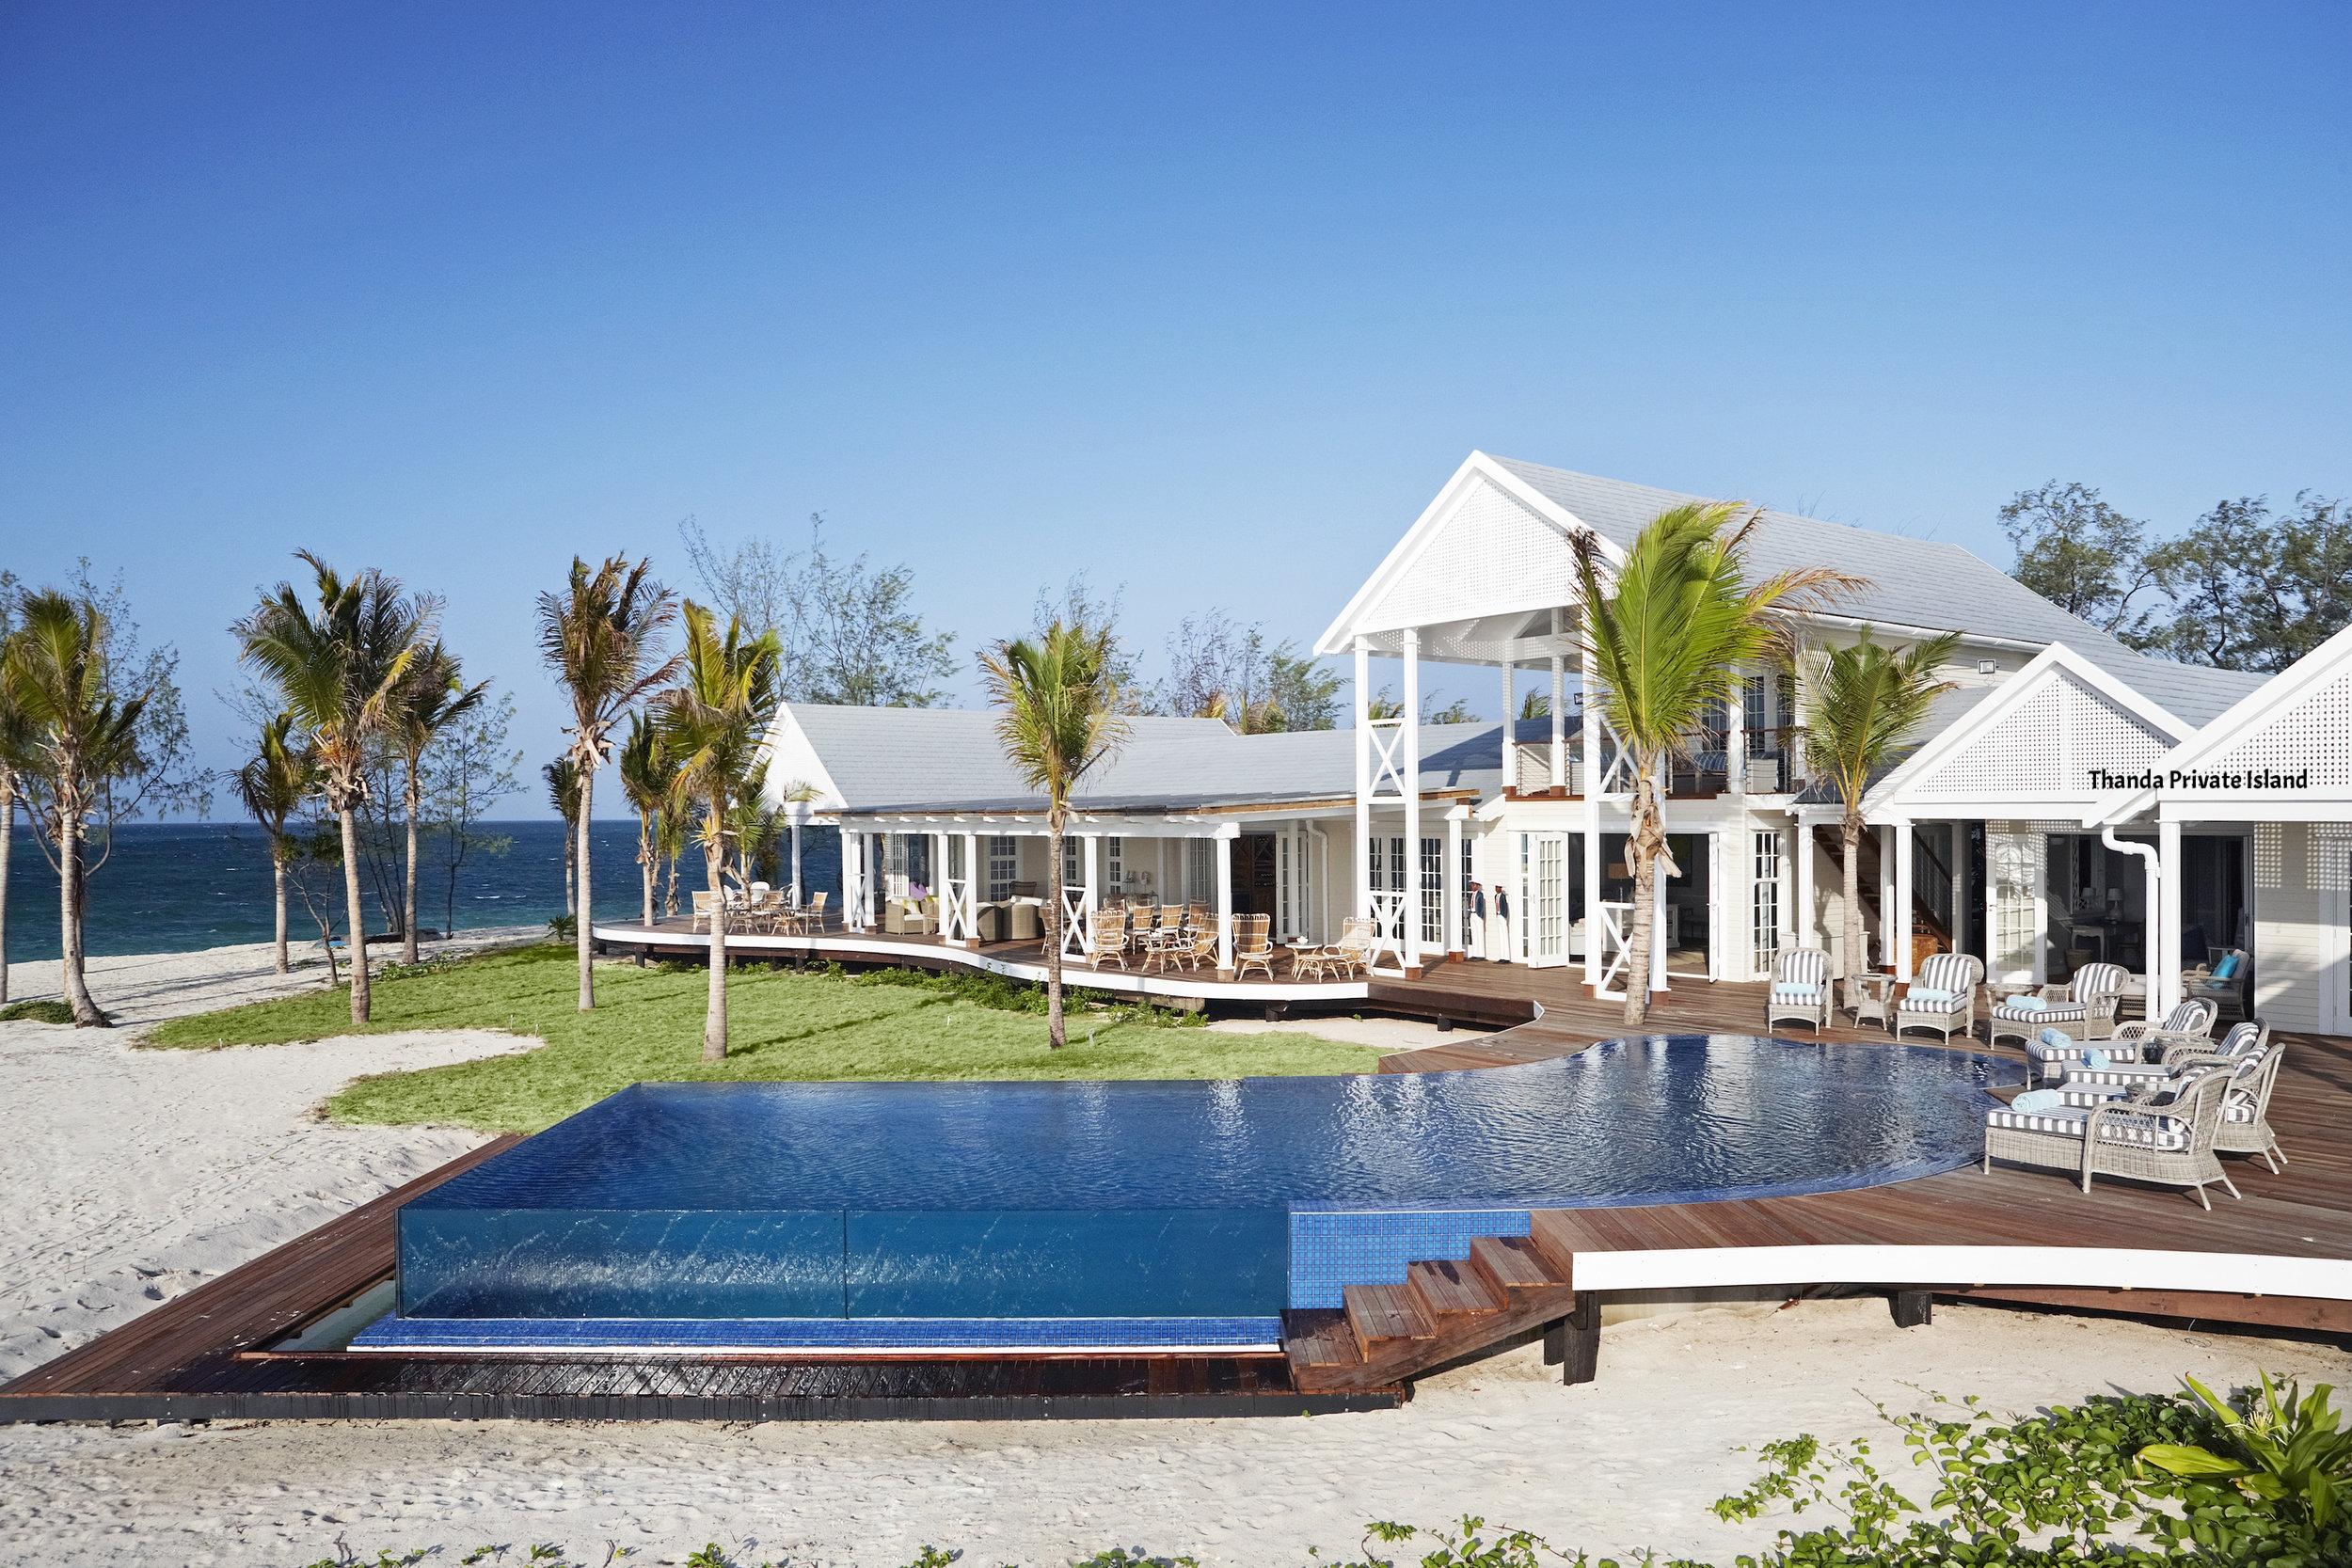 Thanda_Island_Villa_Outside_takims_holidays.jpg